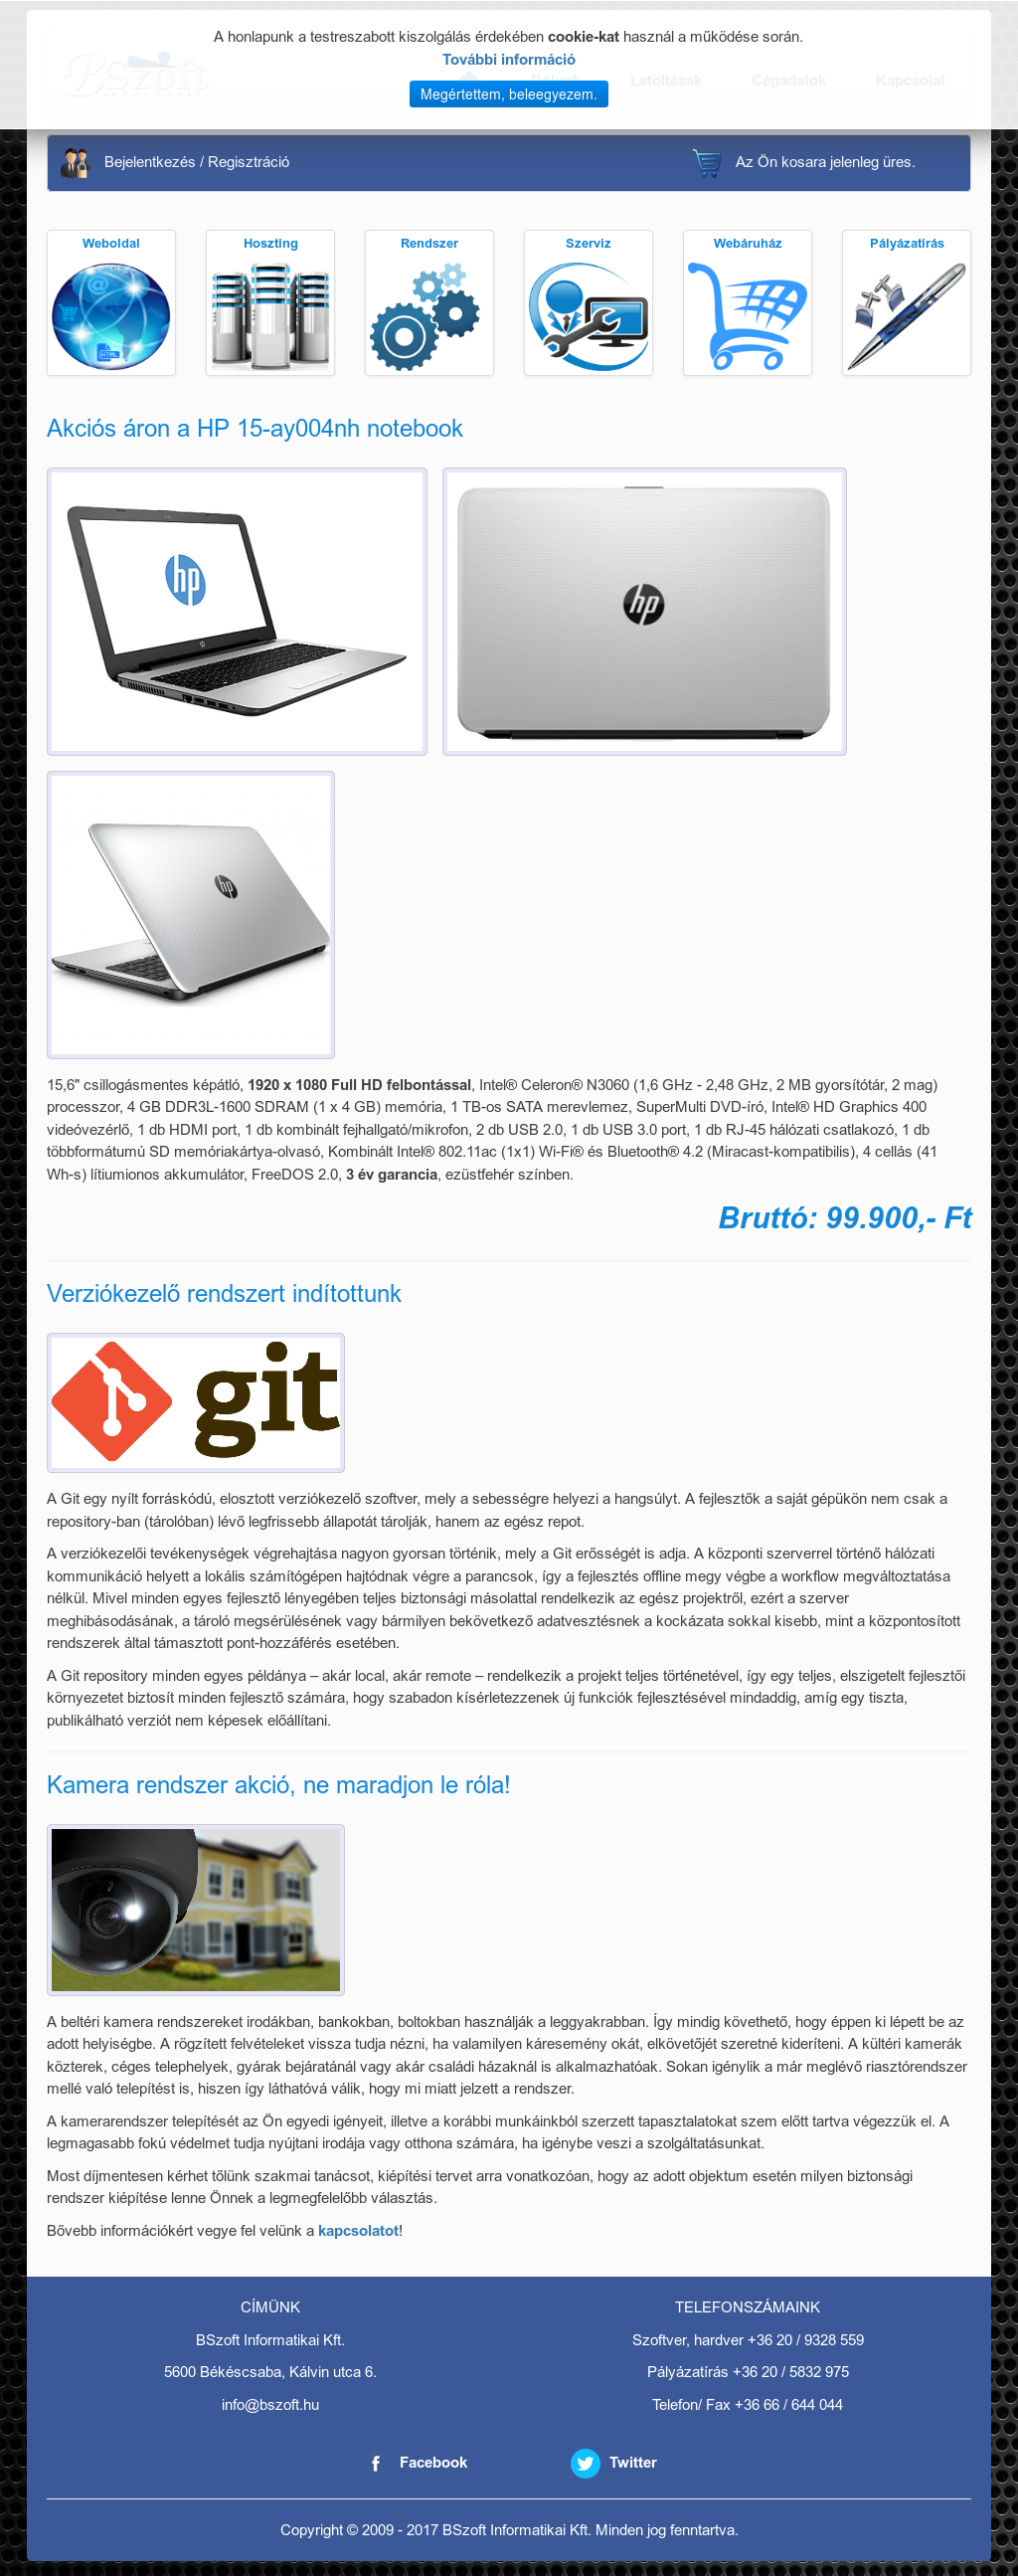 Bszoft Informatikai Kft Competitors 9312bd0b0c